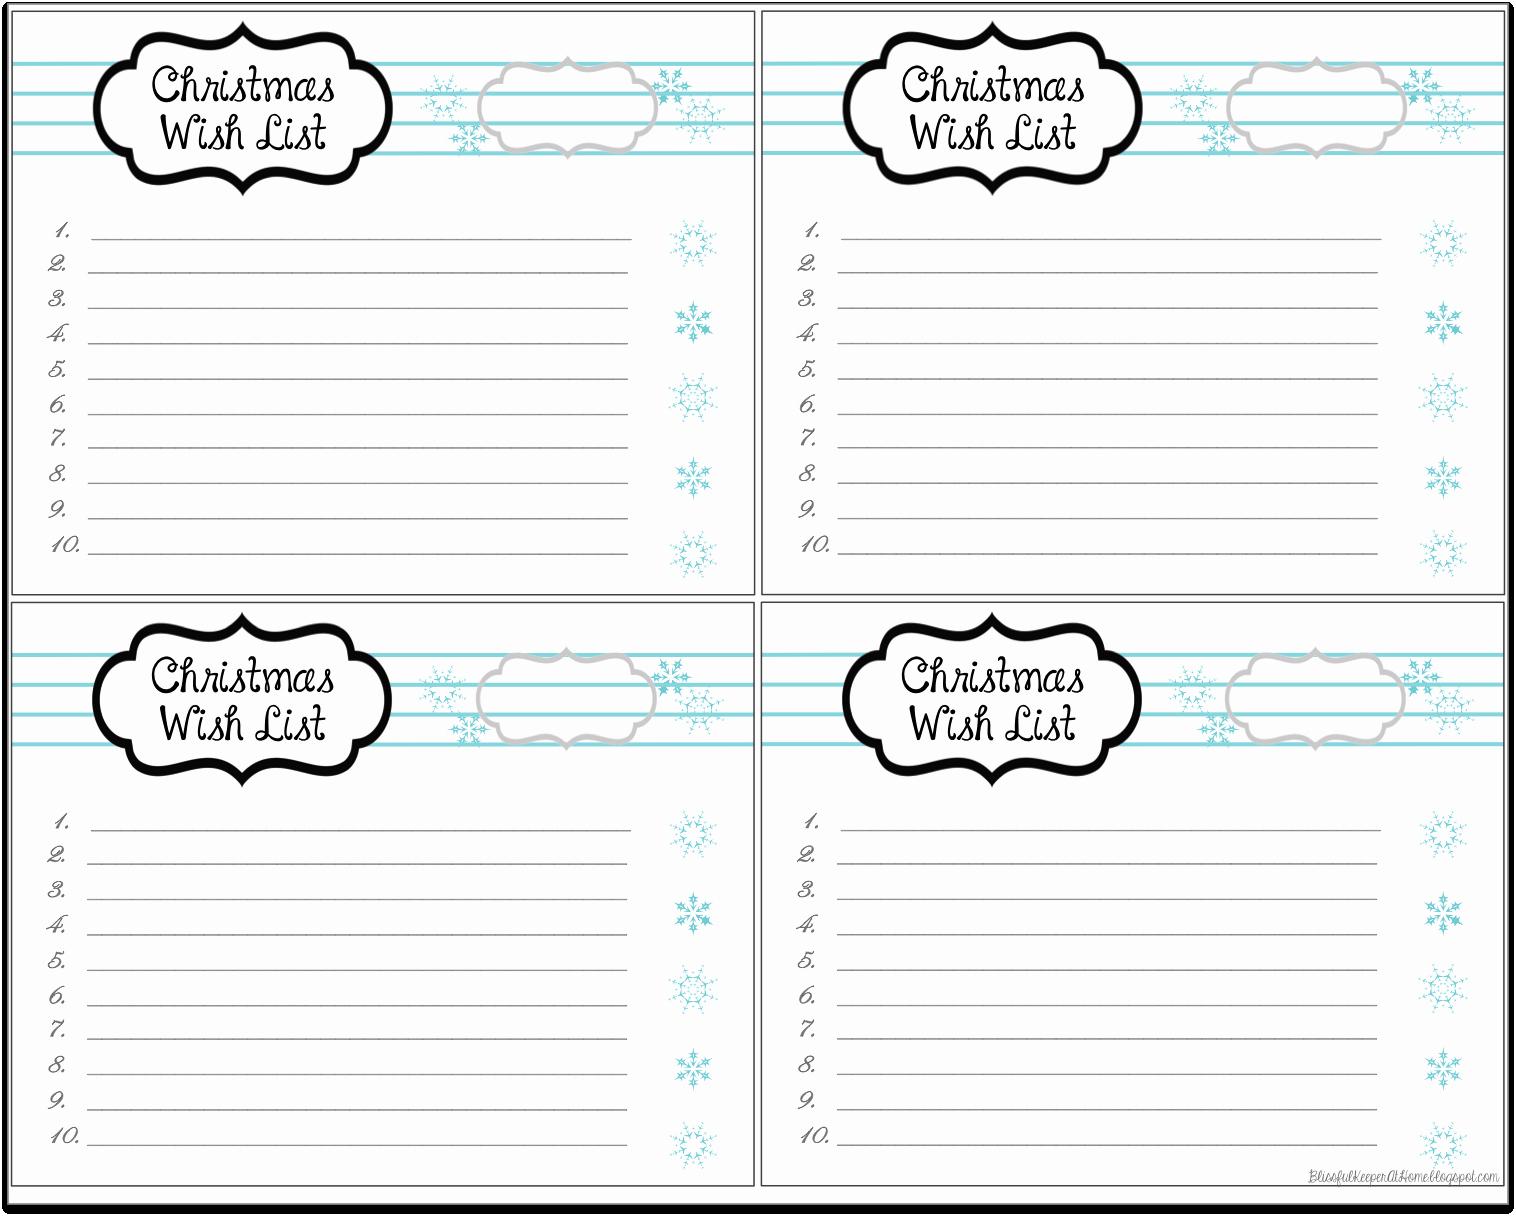 Wish List Template Microsoft Word New Contemporary Santa Wish List Line Mold Administrative